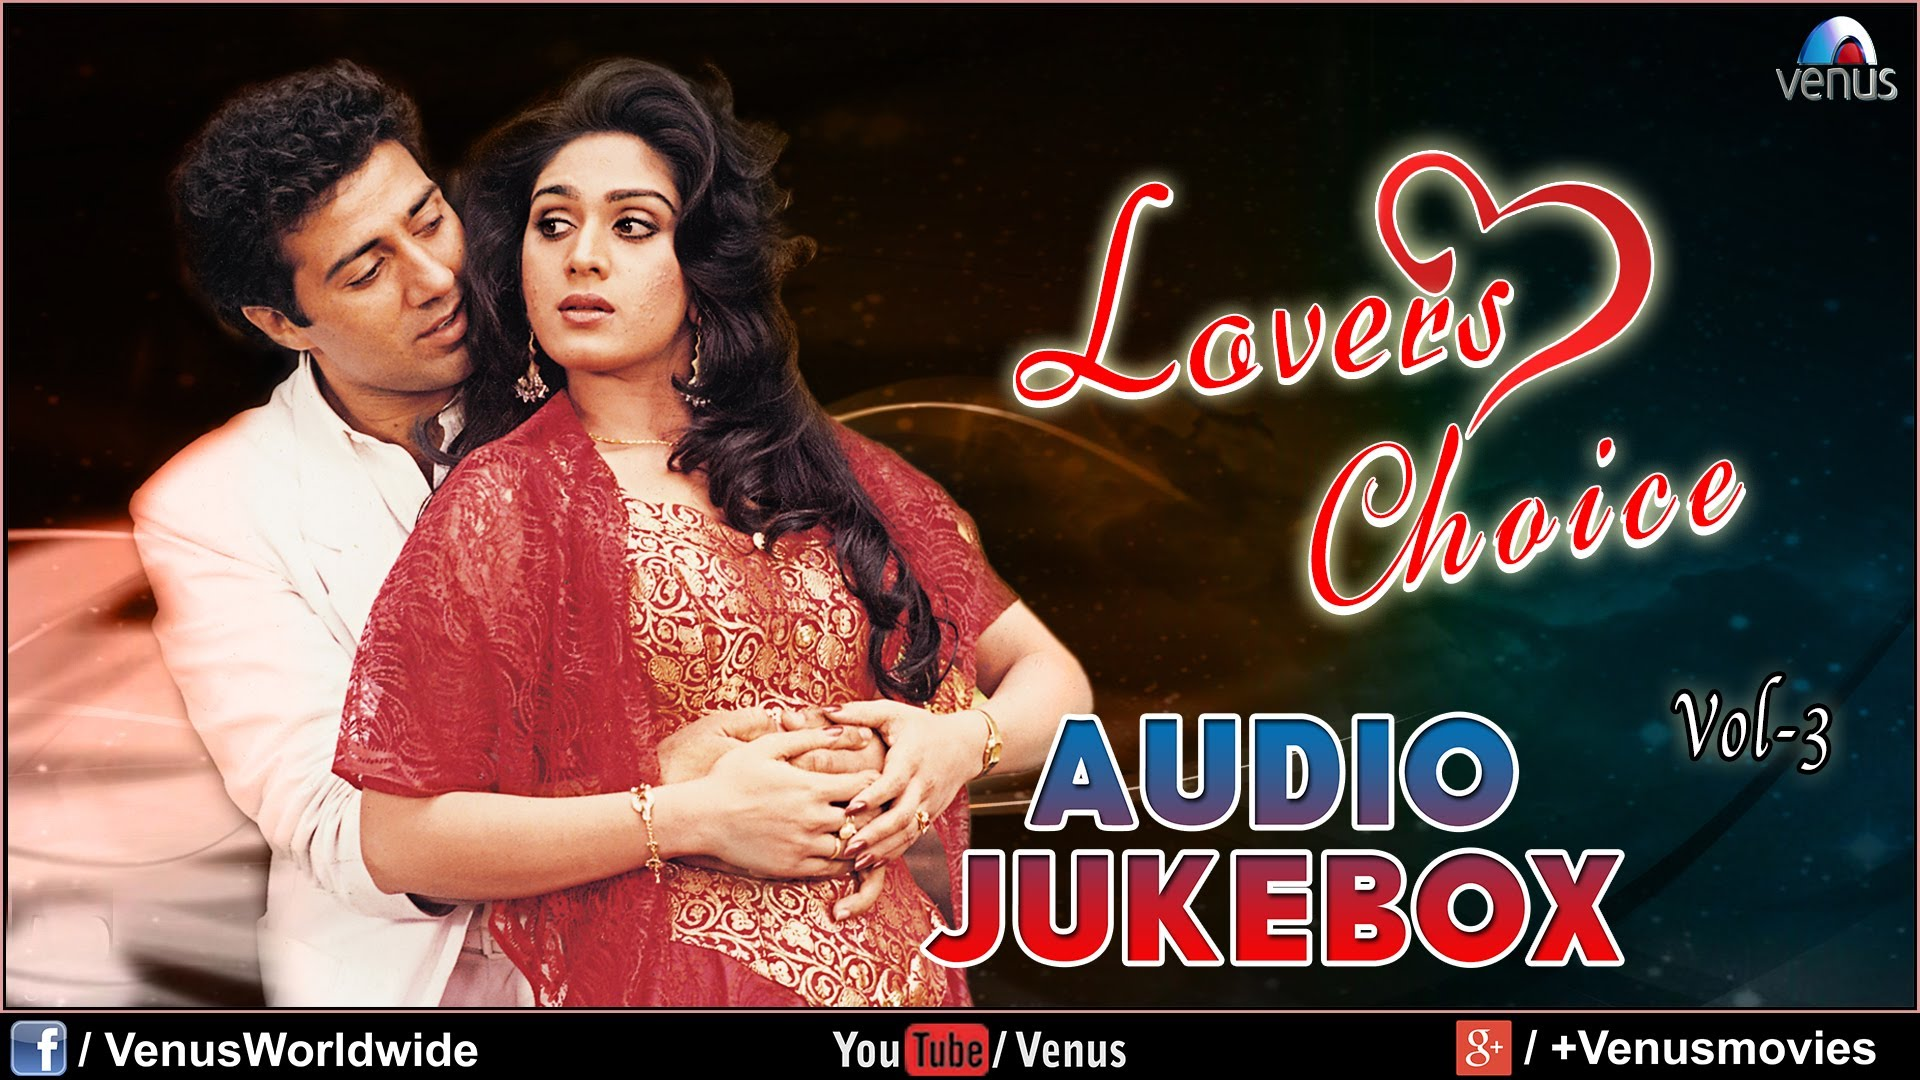 Lovers Choice - Vol 3 (Audio Jukebox) - YouTube